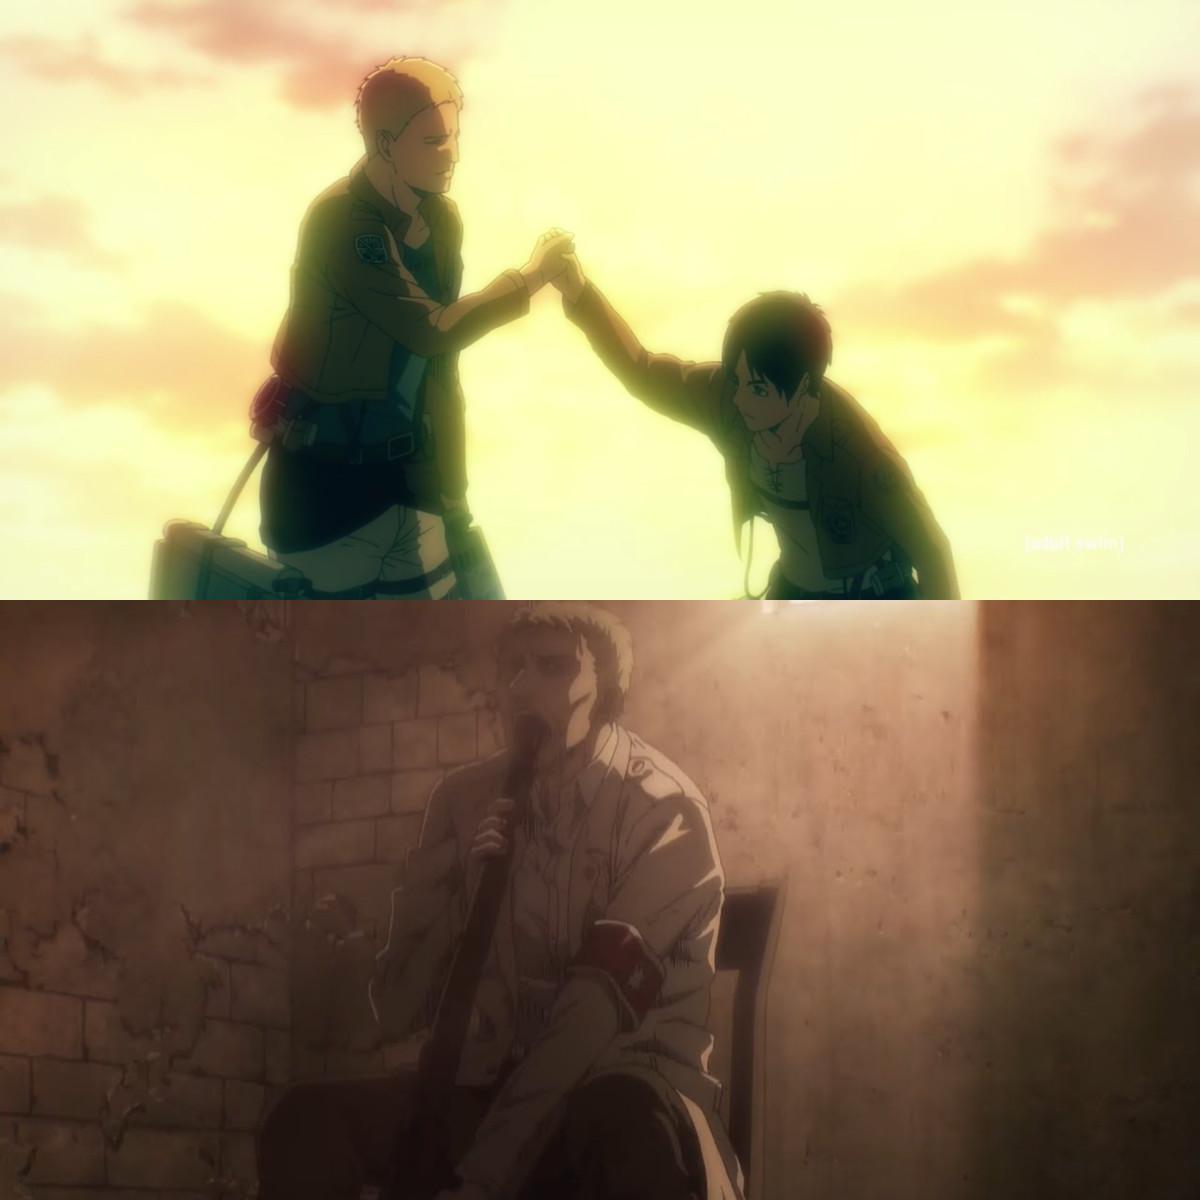 the-door-of-hope-attack-on-titan-season-4-episode-3-review